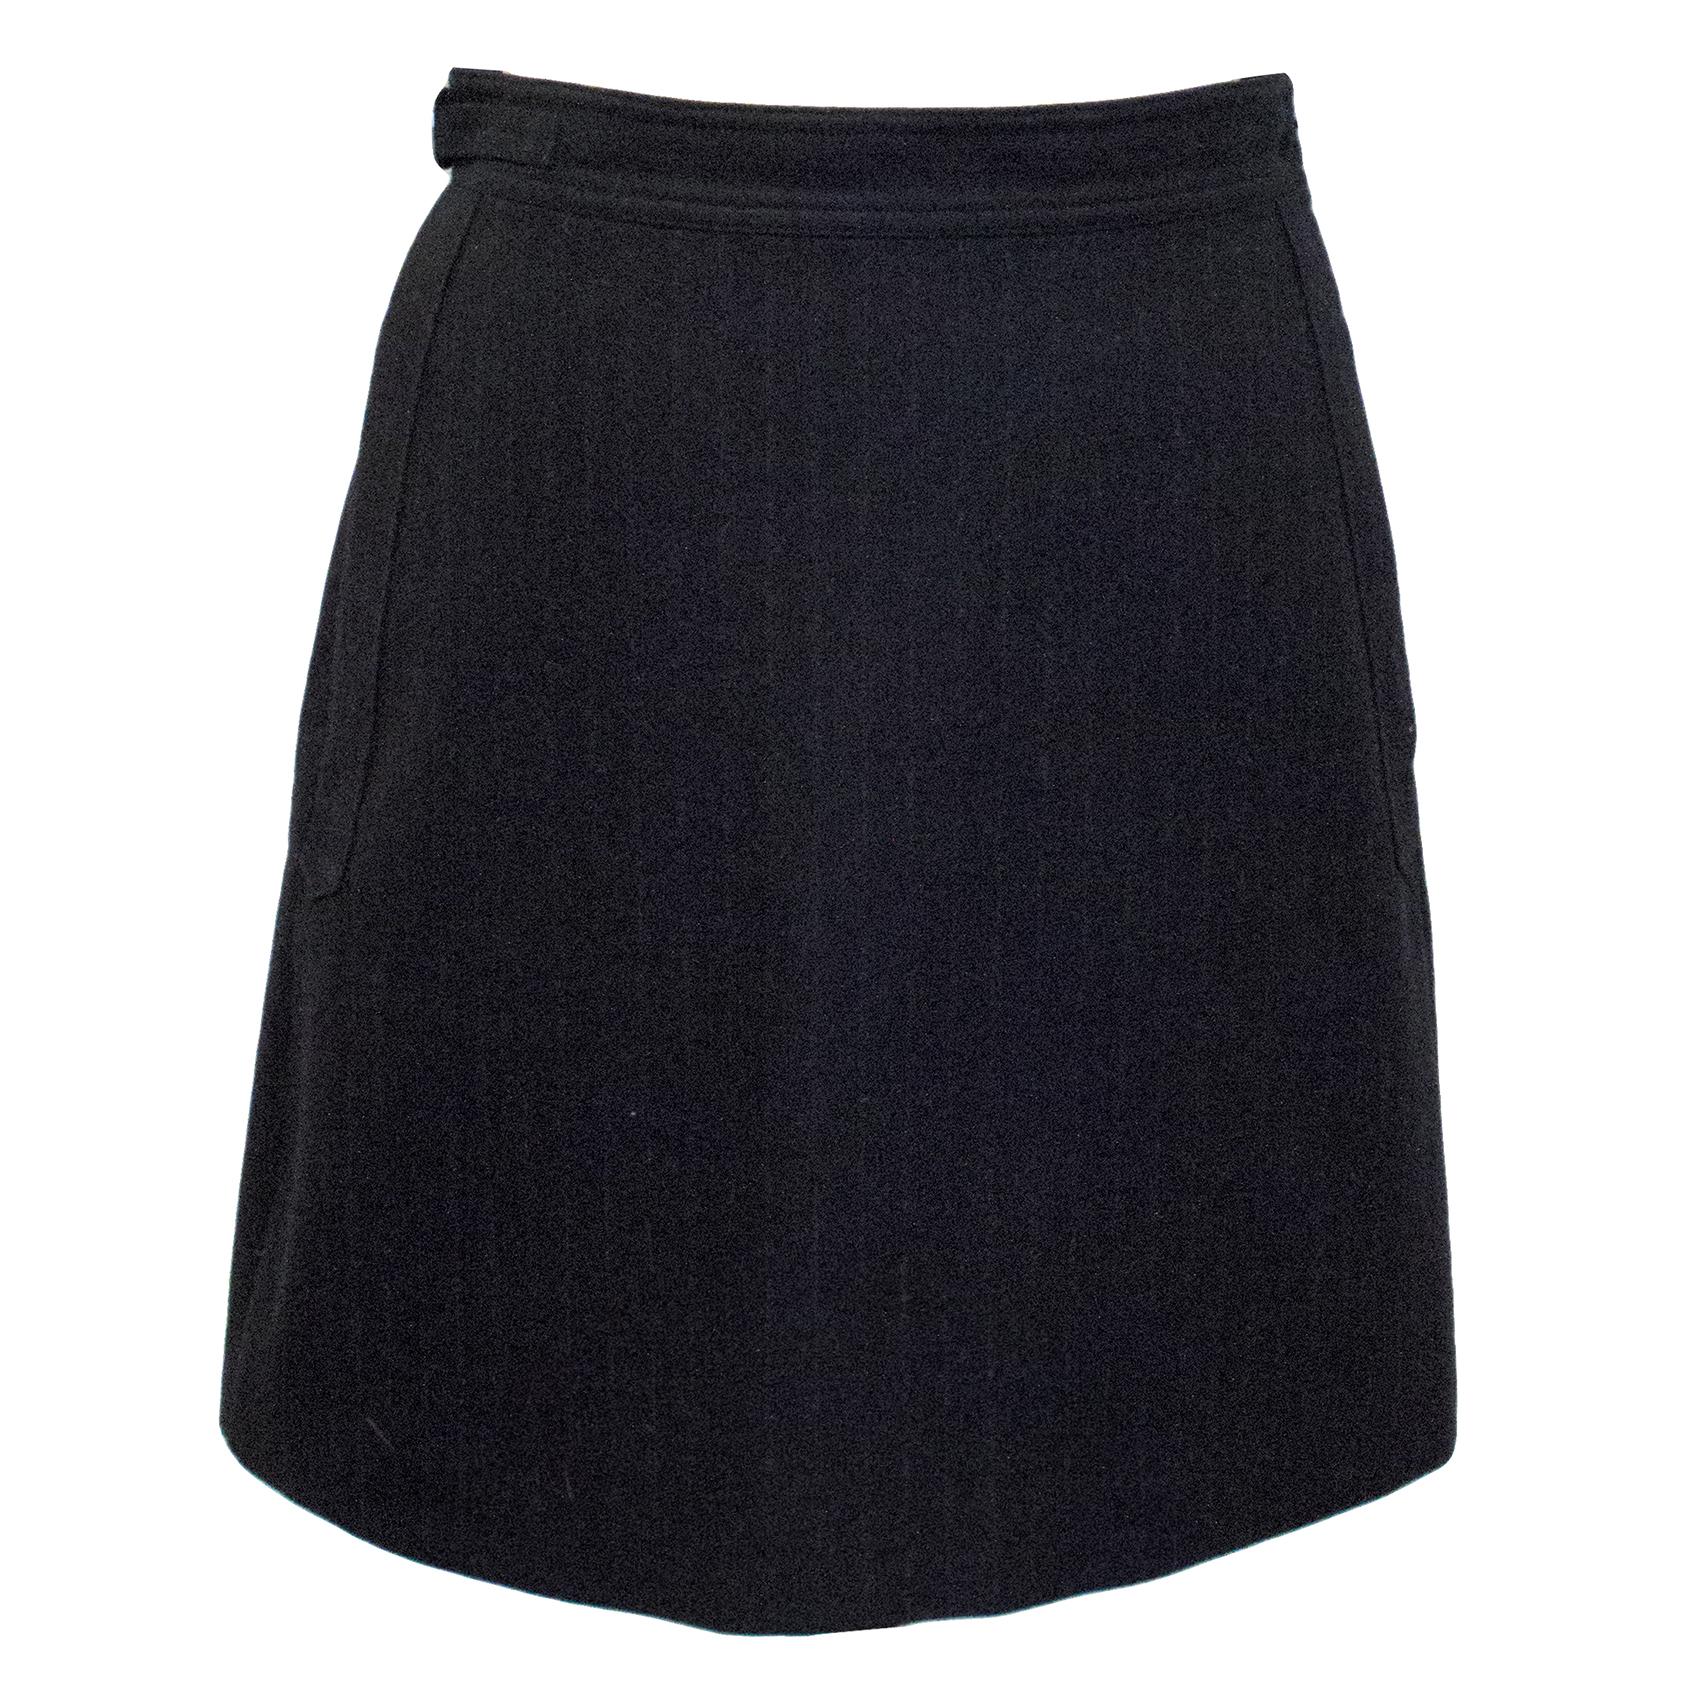 A.P.C Grey Pinstripe Wool Skirt